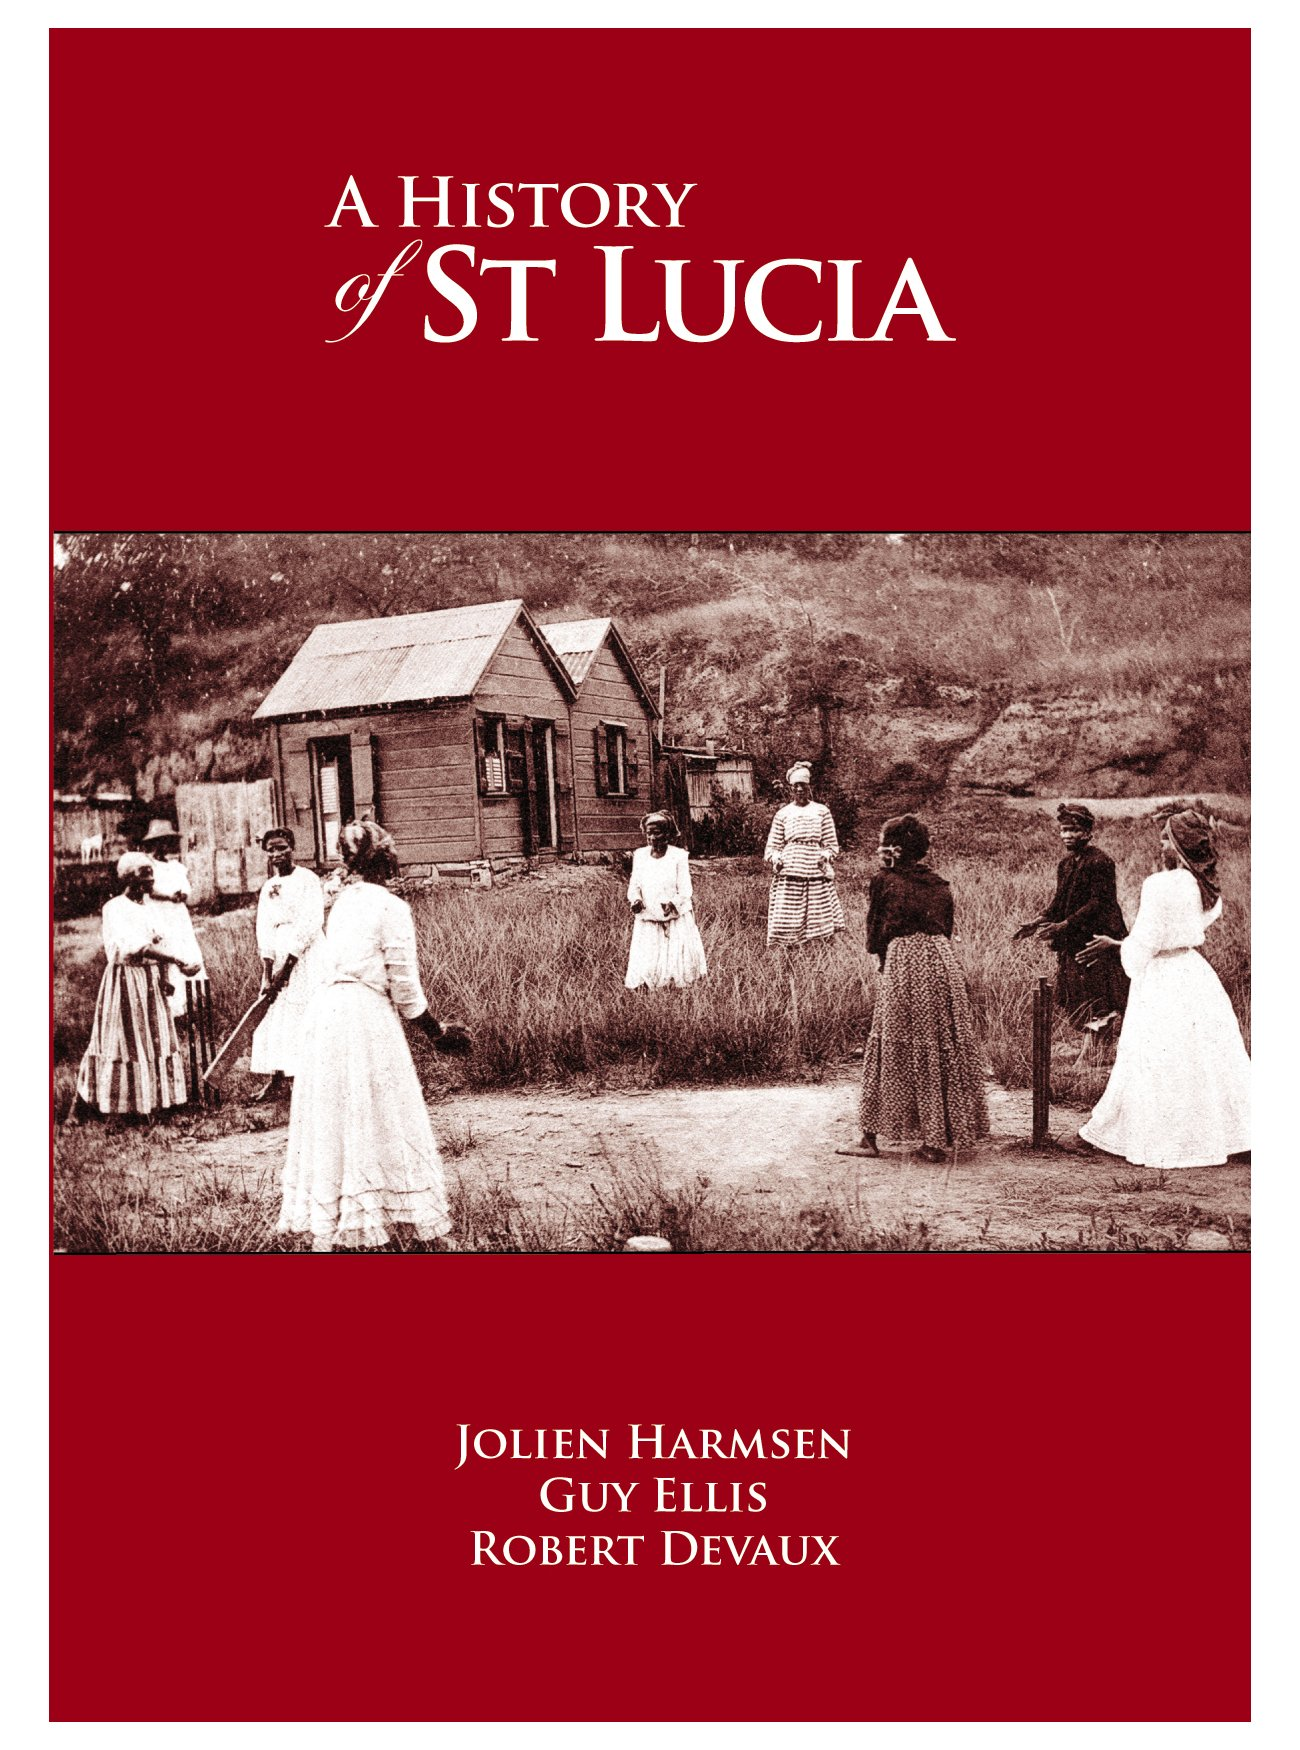 A History of St Lucia: Jolien Harmsen, Guy Ellis, Robert Devaux:  9789769534001: Amazon.com: Books